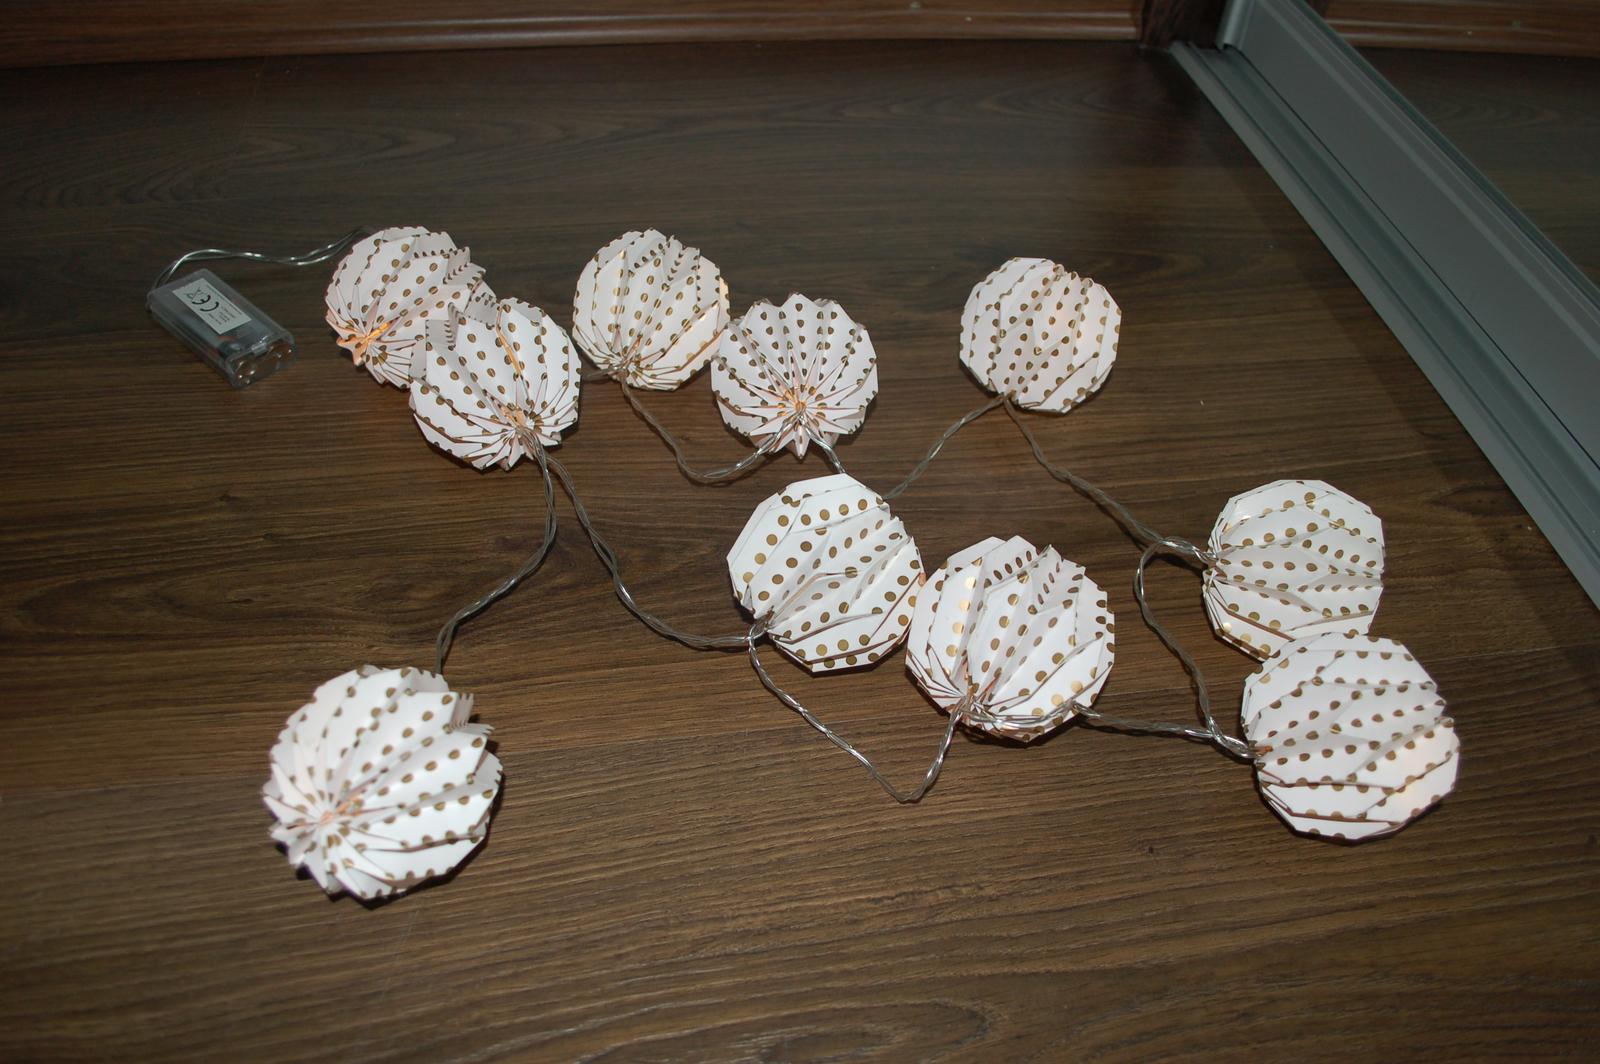 Svetielka-lampasiky- 1m - Obrázok č. 1